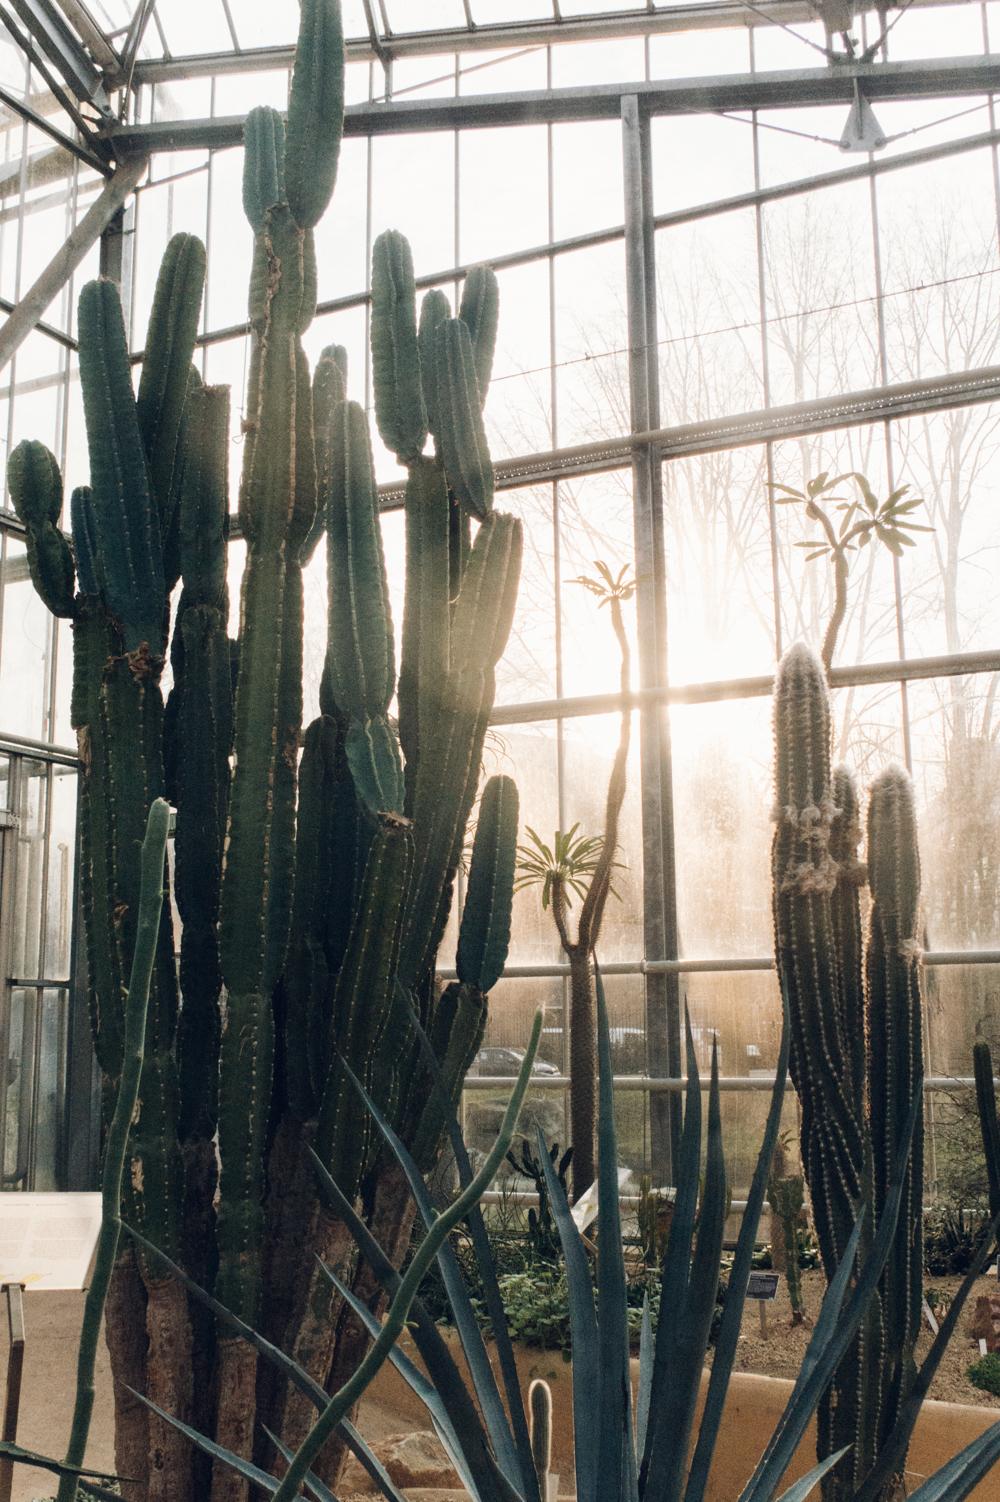 Haarkon Cactus PlantsonPink Tropical Desert Mexico Amsterdam